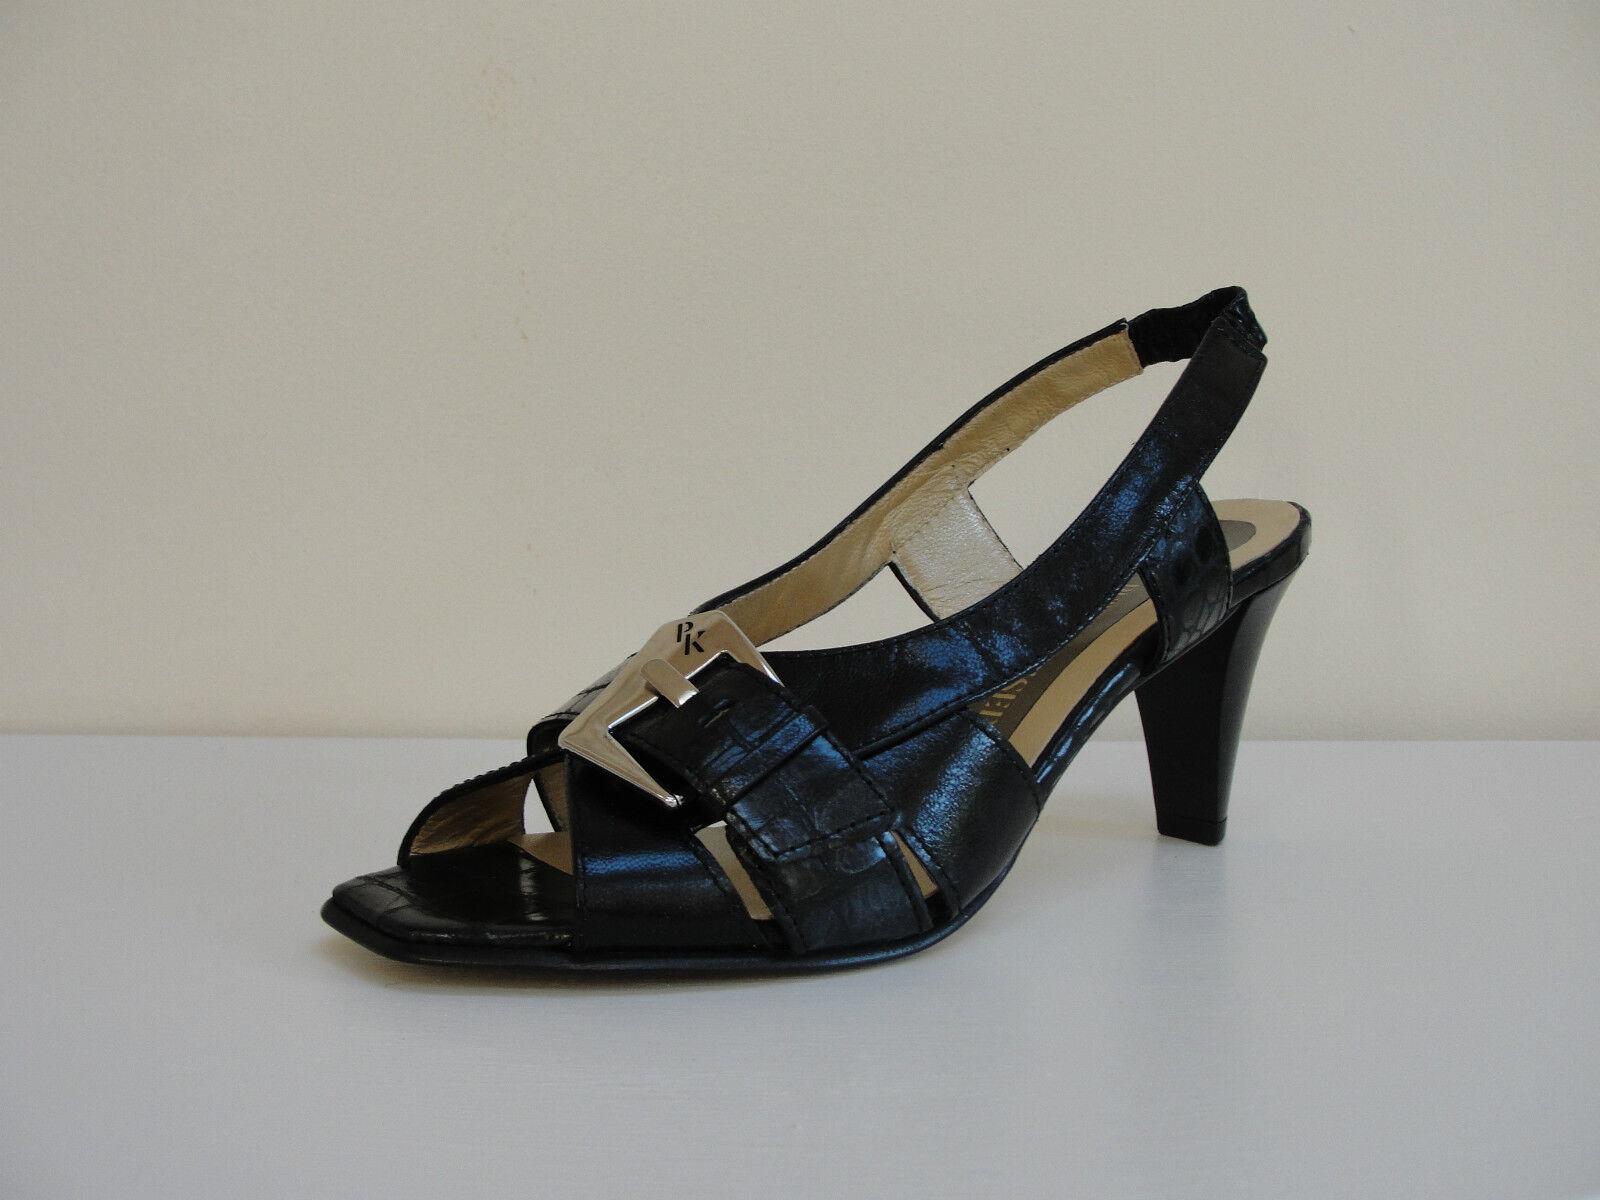 Peter Kaiser Faria black leather open toe slingbacks, UK 3 EU 36,   BNWB